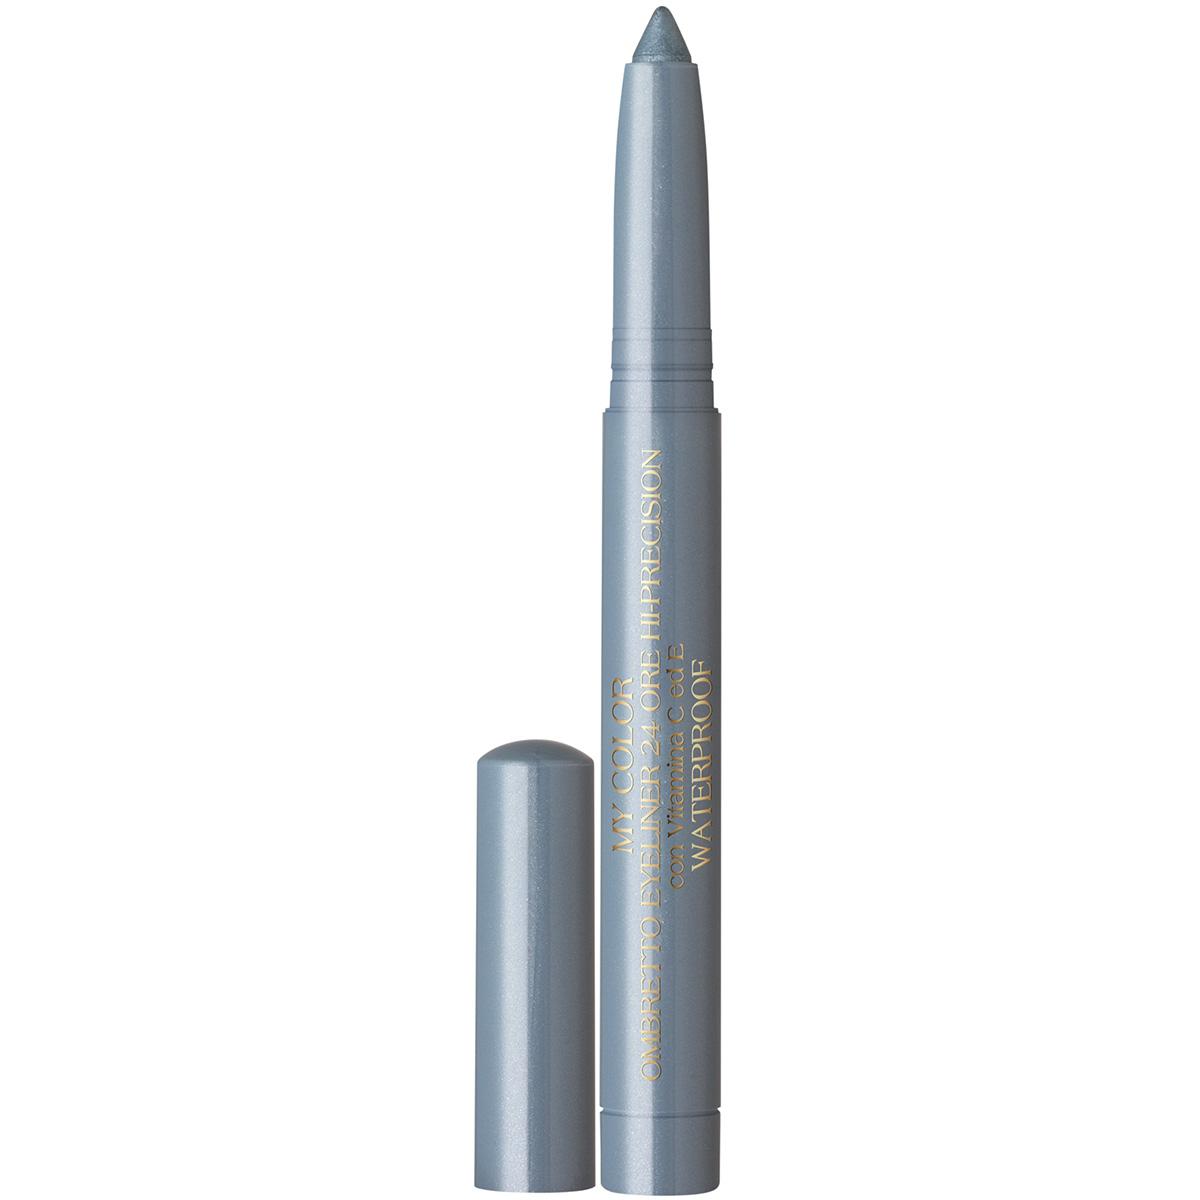 My Color - Fard De Pleoape Stick 24 Ore  Cu Vitaminele C Si E - Rezistent La Apa